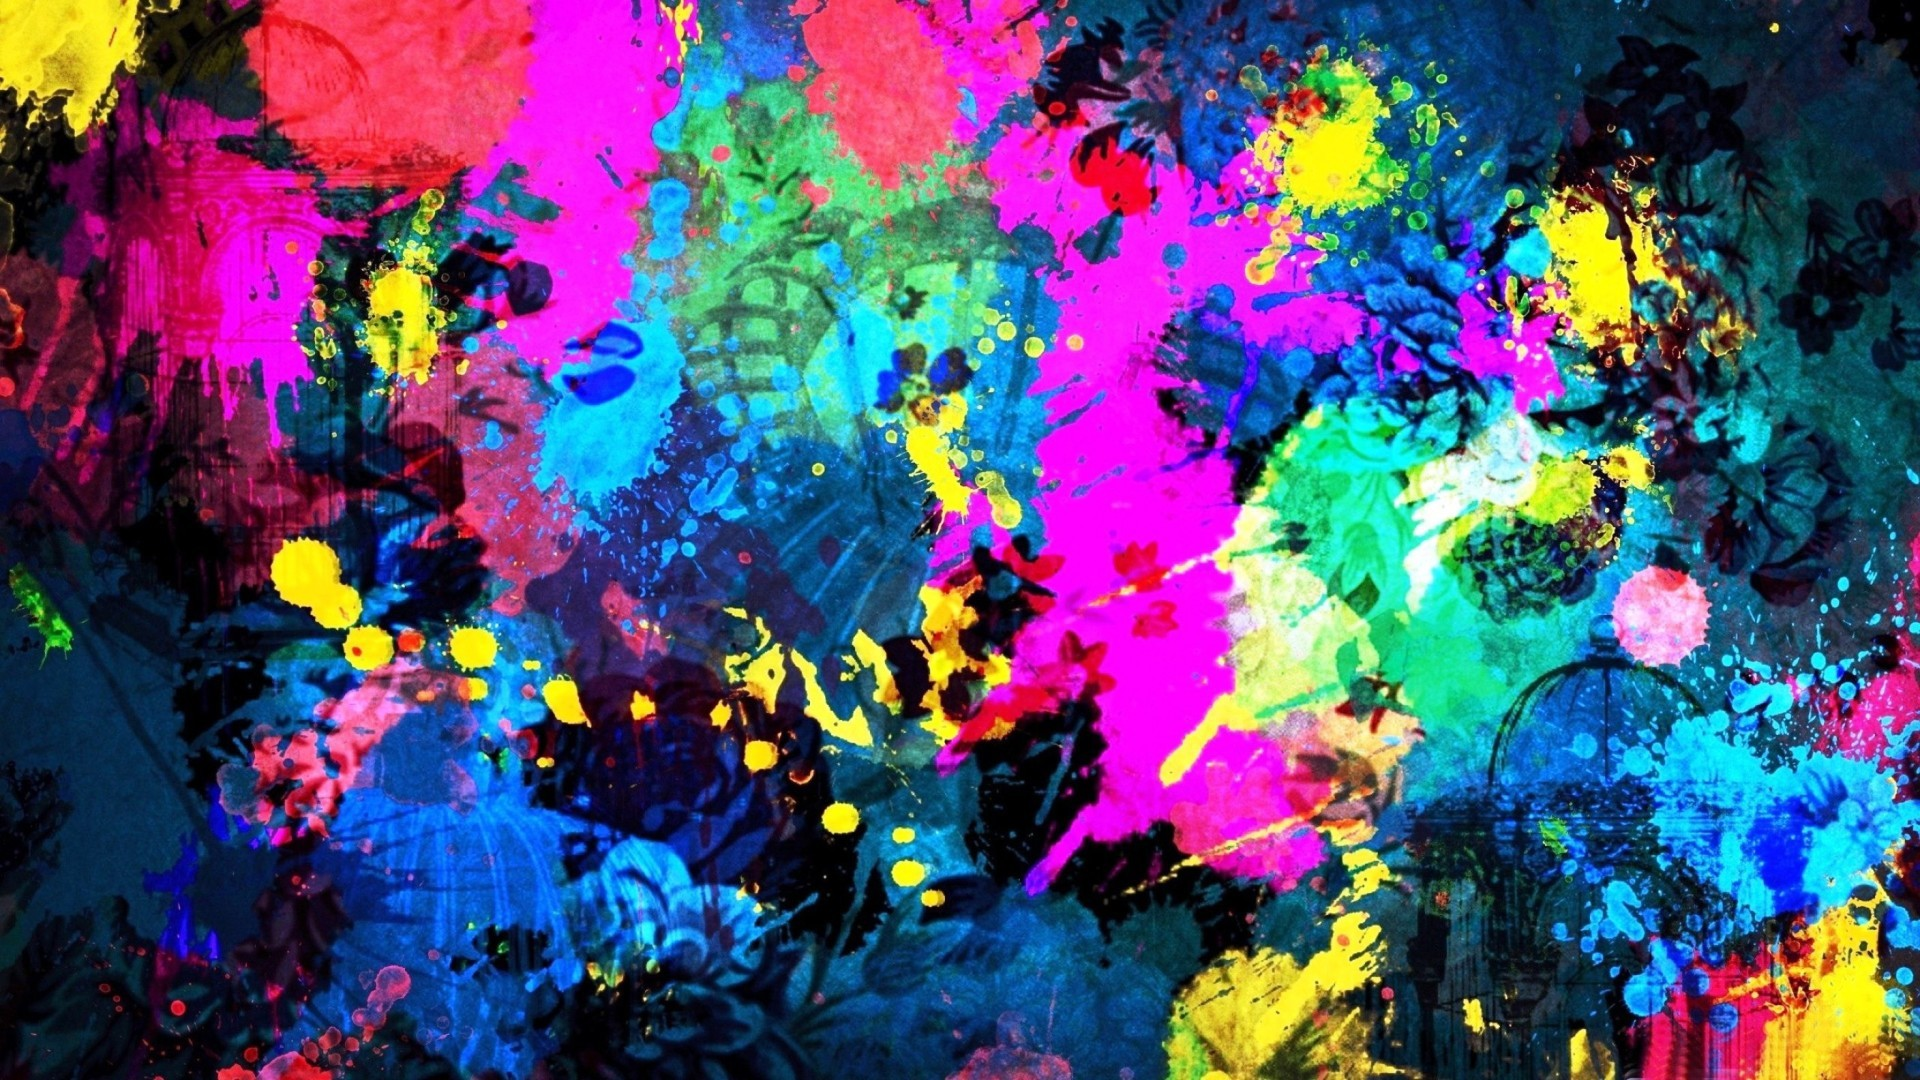 Cool Abstract Art Backgrounds HD Wallpaper